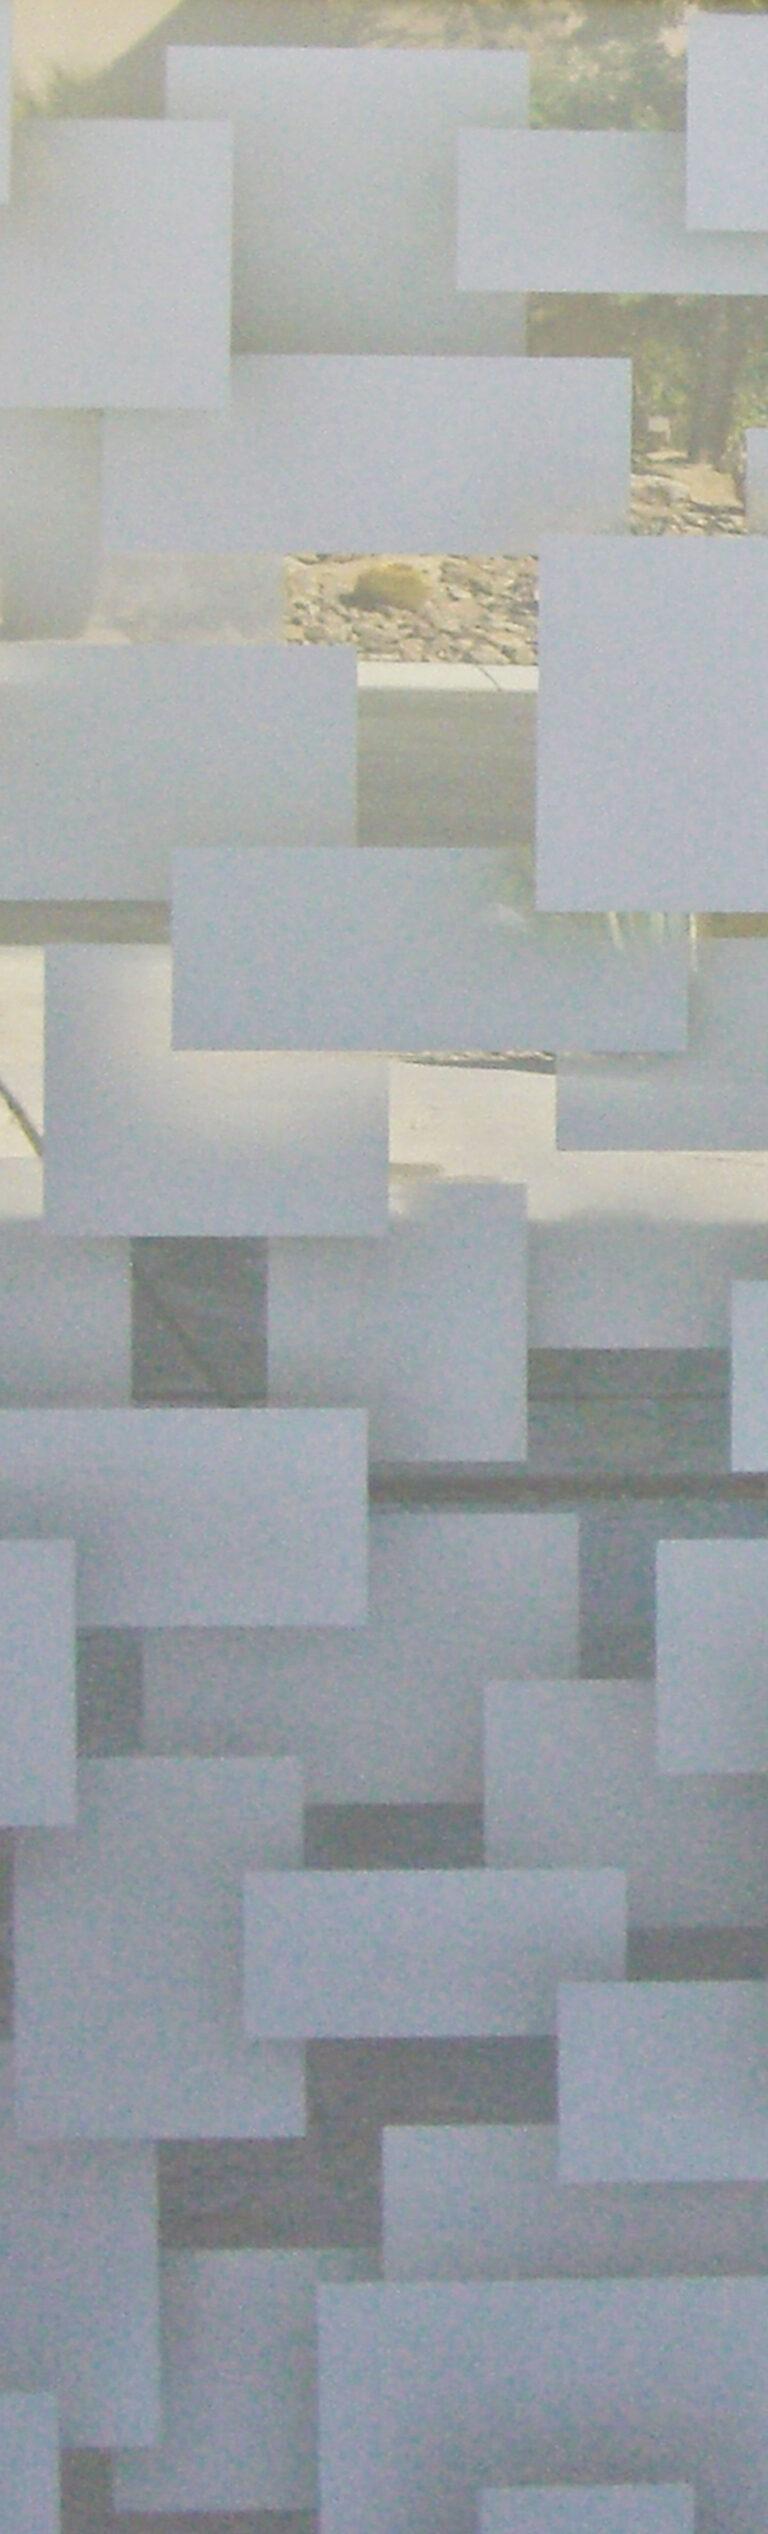 Cubes Tall